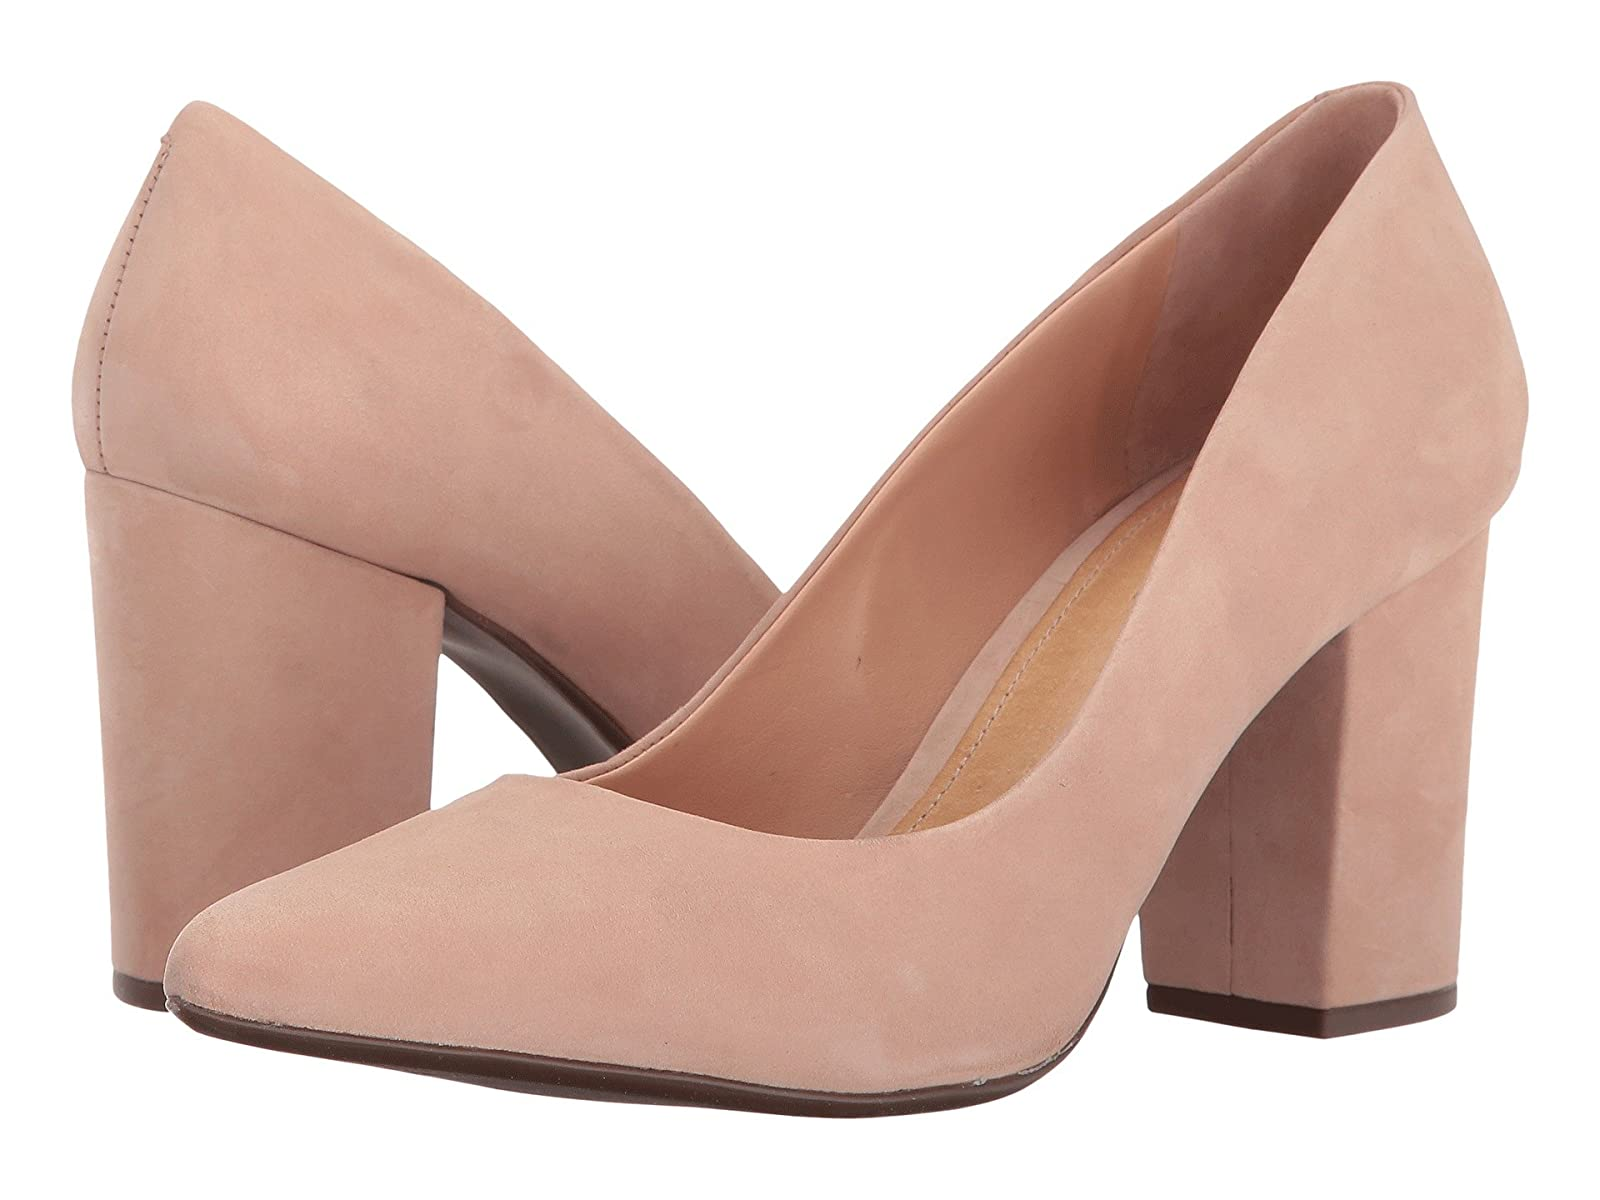 Schutz MoranitaCheap and distinctive eye-catching shoes